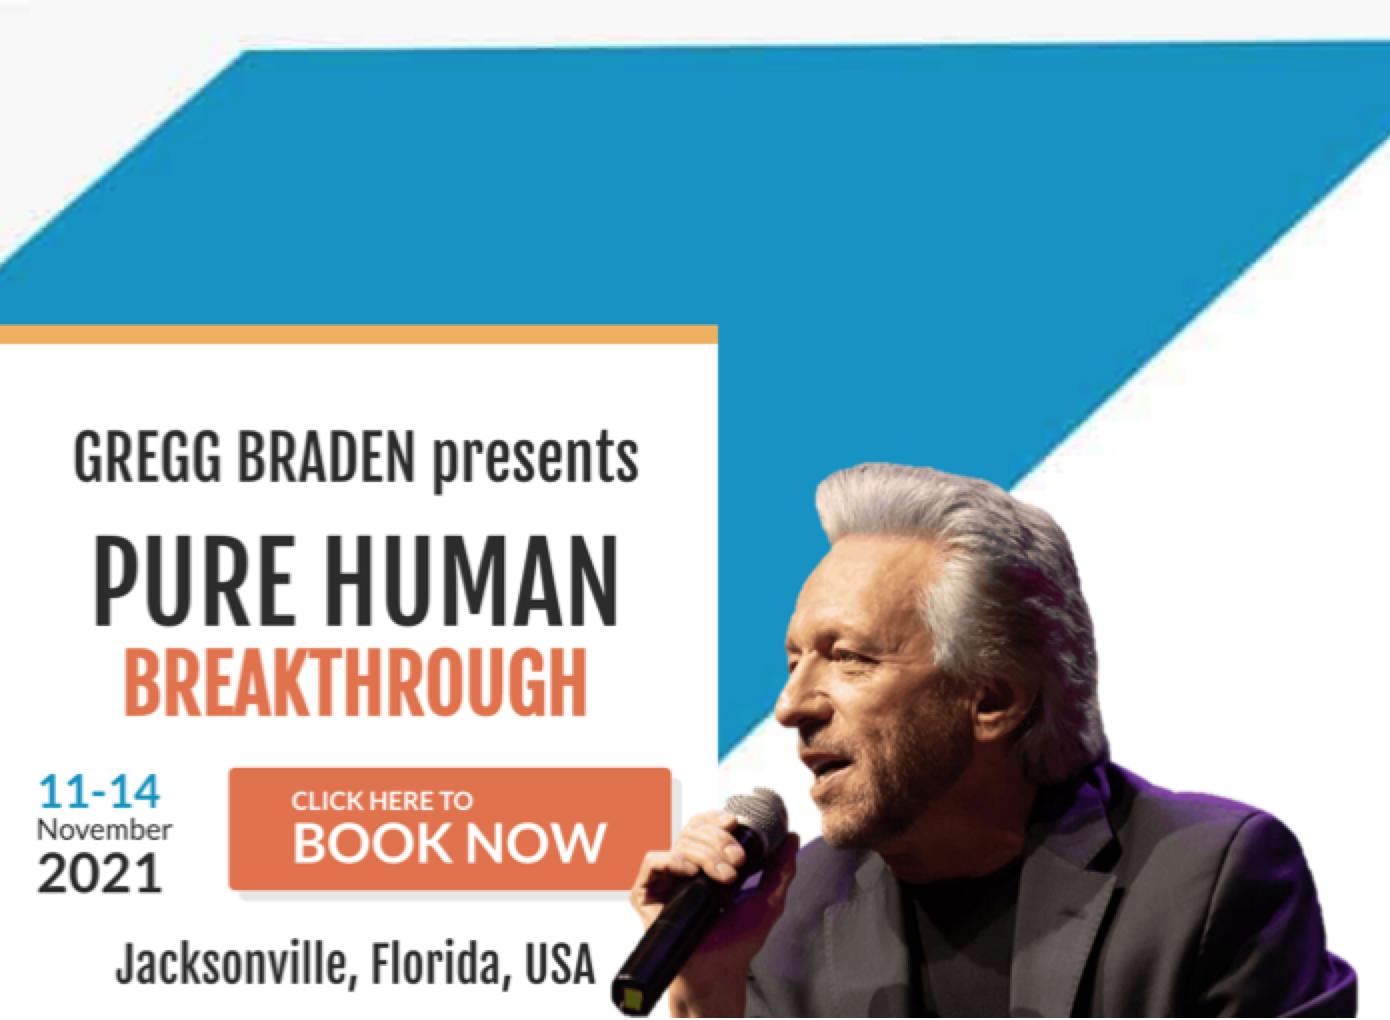 Pure Human: Breakthrough